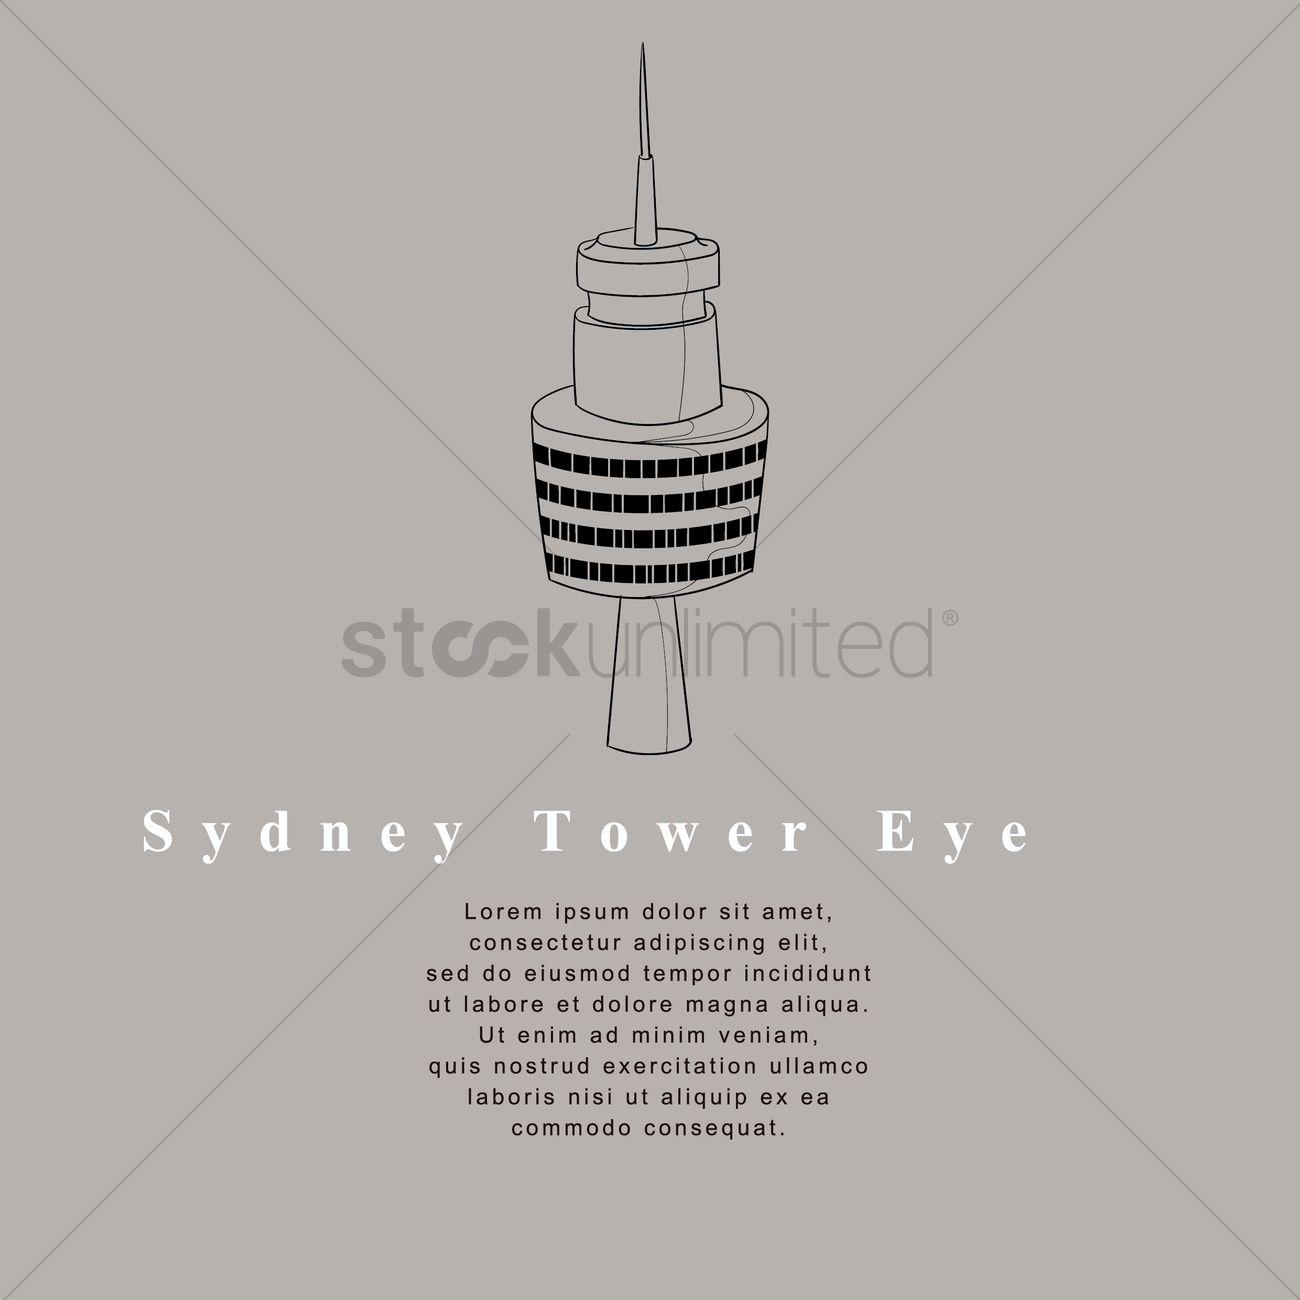 Sydney tower eye design Vector Image - 1952610 | StockUnlimited